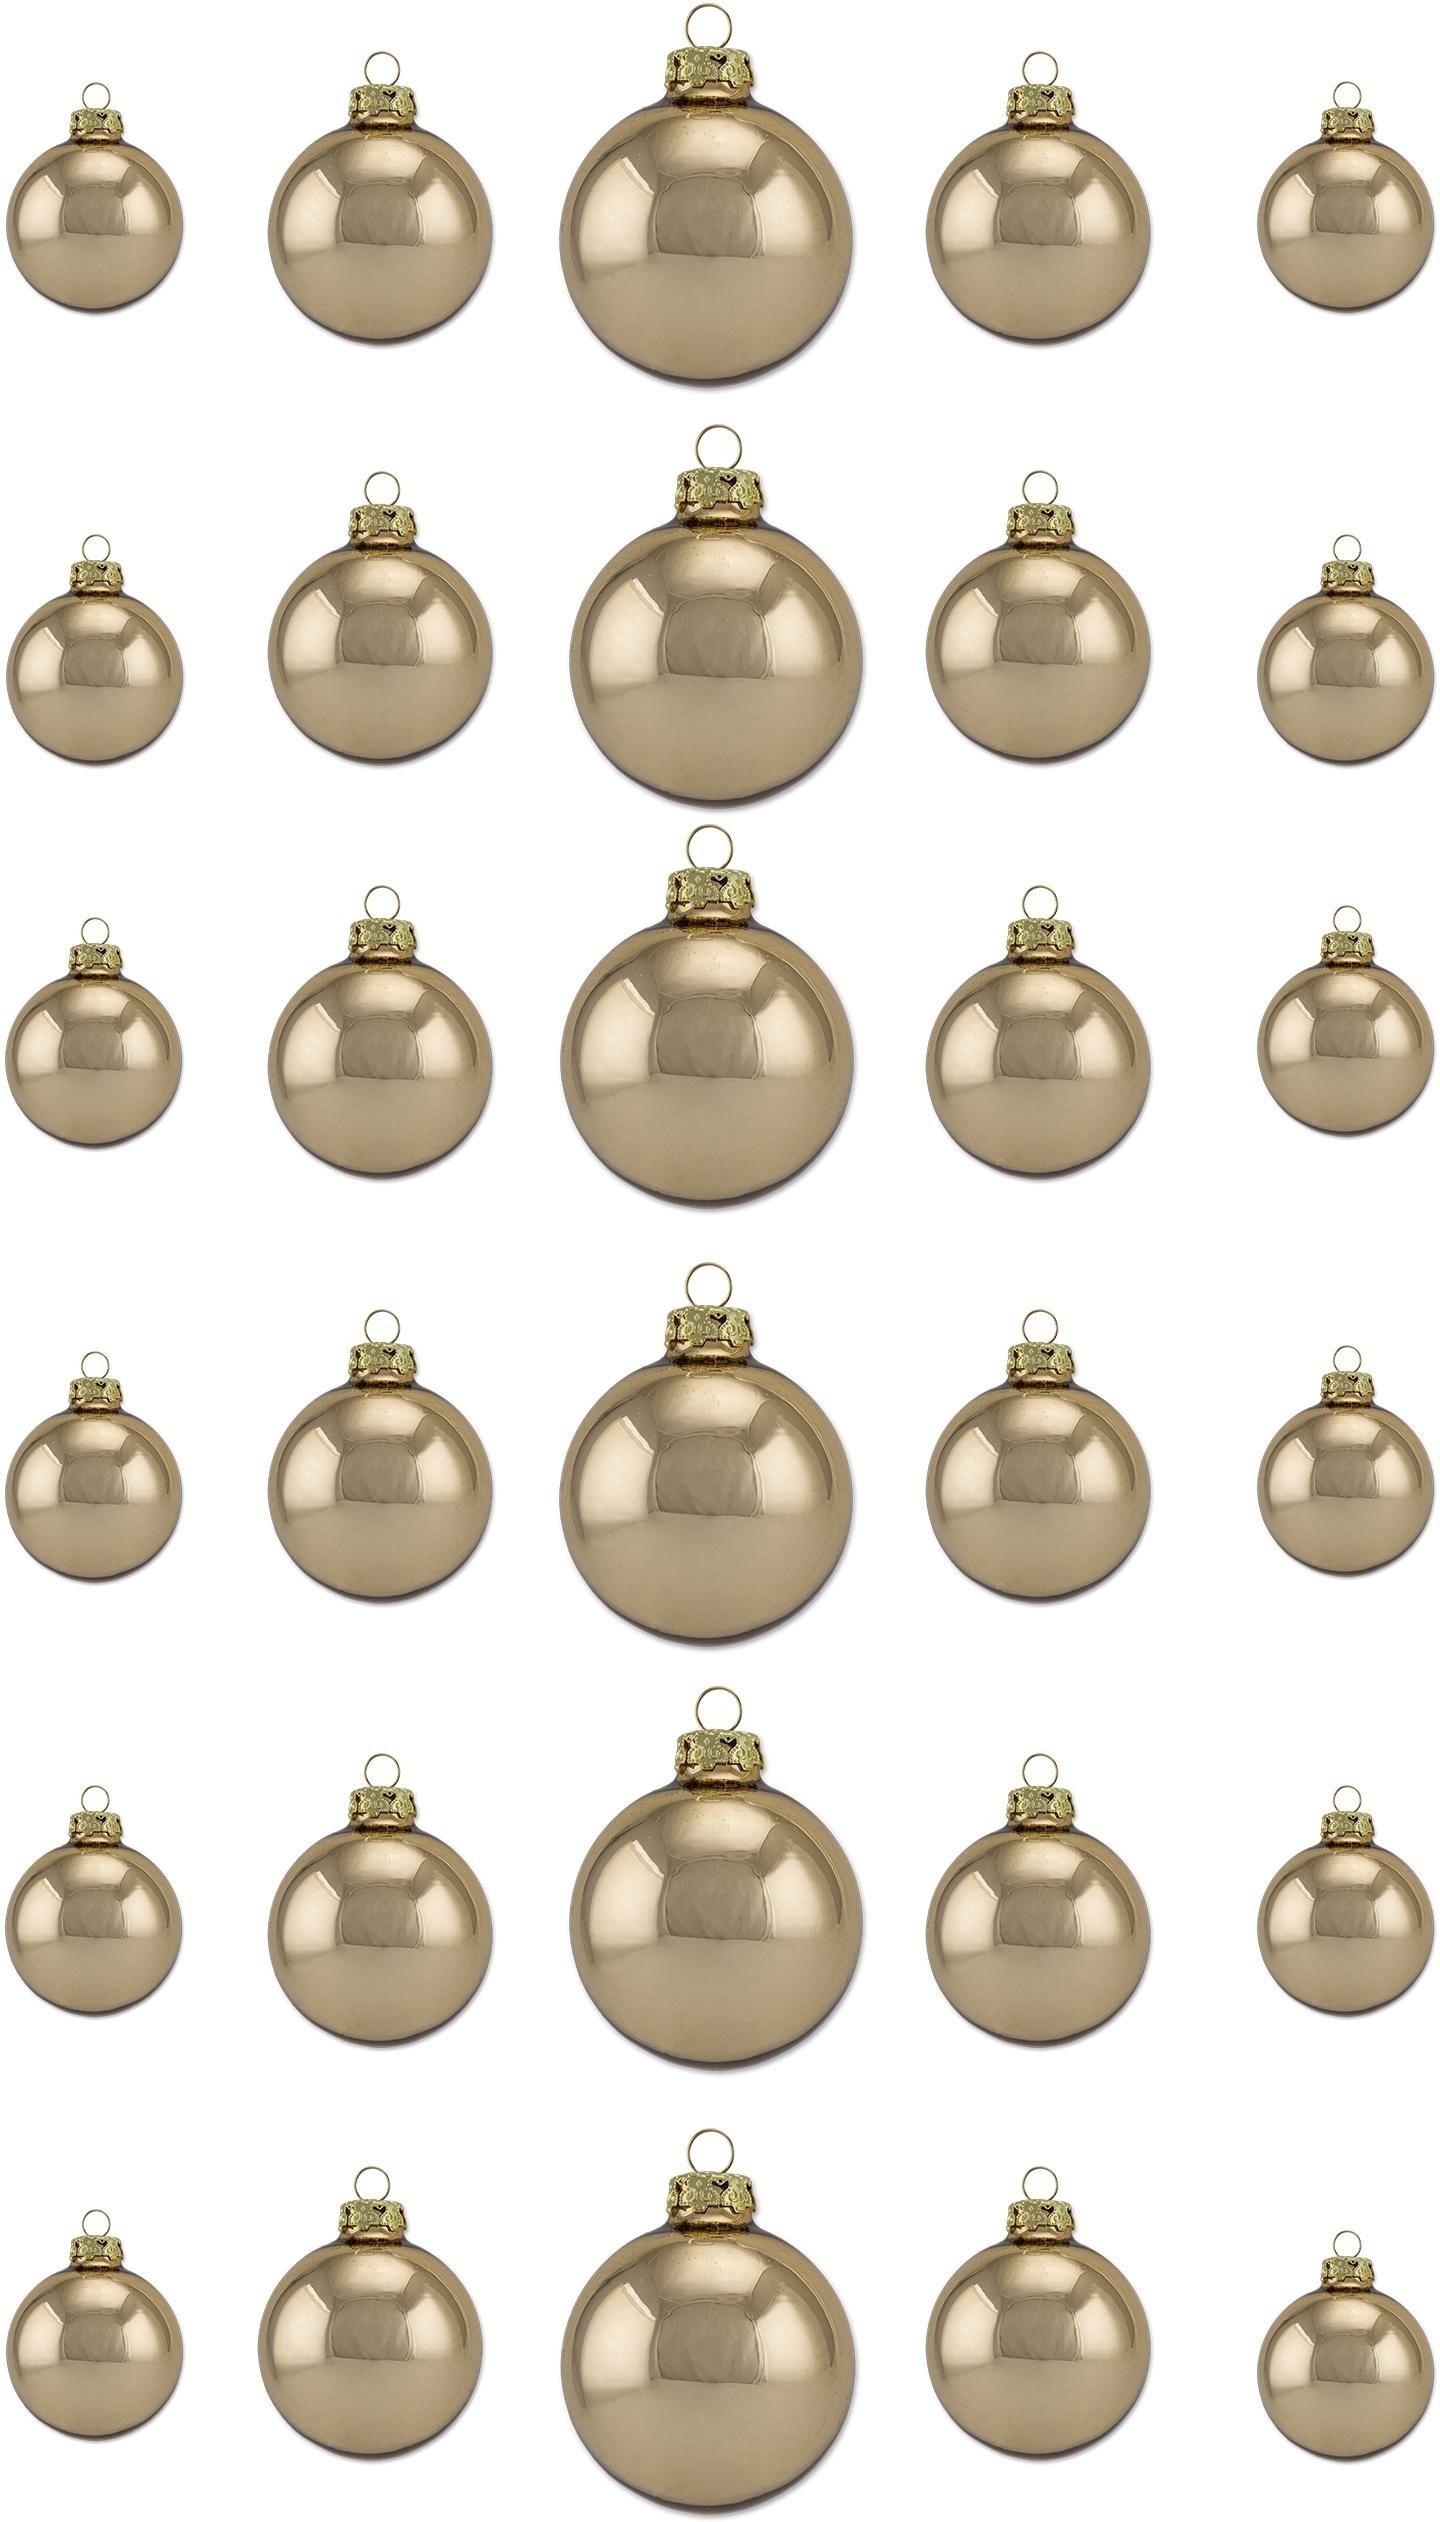 Thüringer Glasdesign kerstbal - gratis ruilen op otto.nl